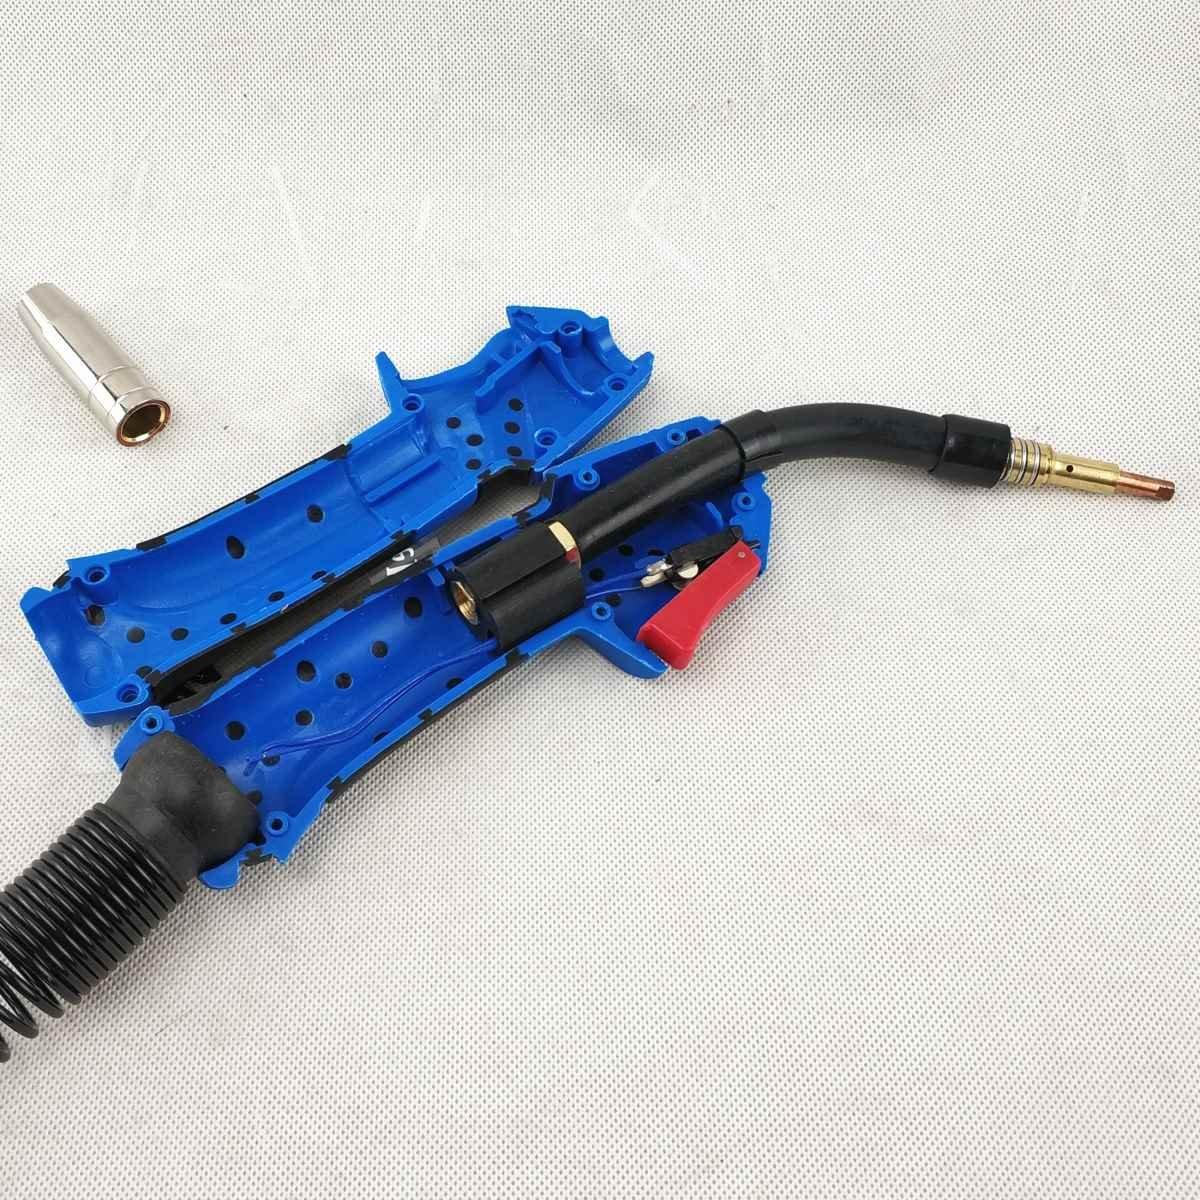 Professional MB 15AK Welding Torch Head 15AK Torch Body 180A MIG//MAG Torch European Style Welding Gun